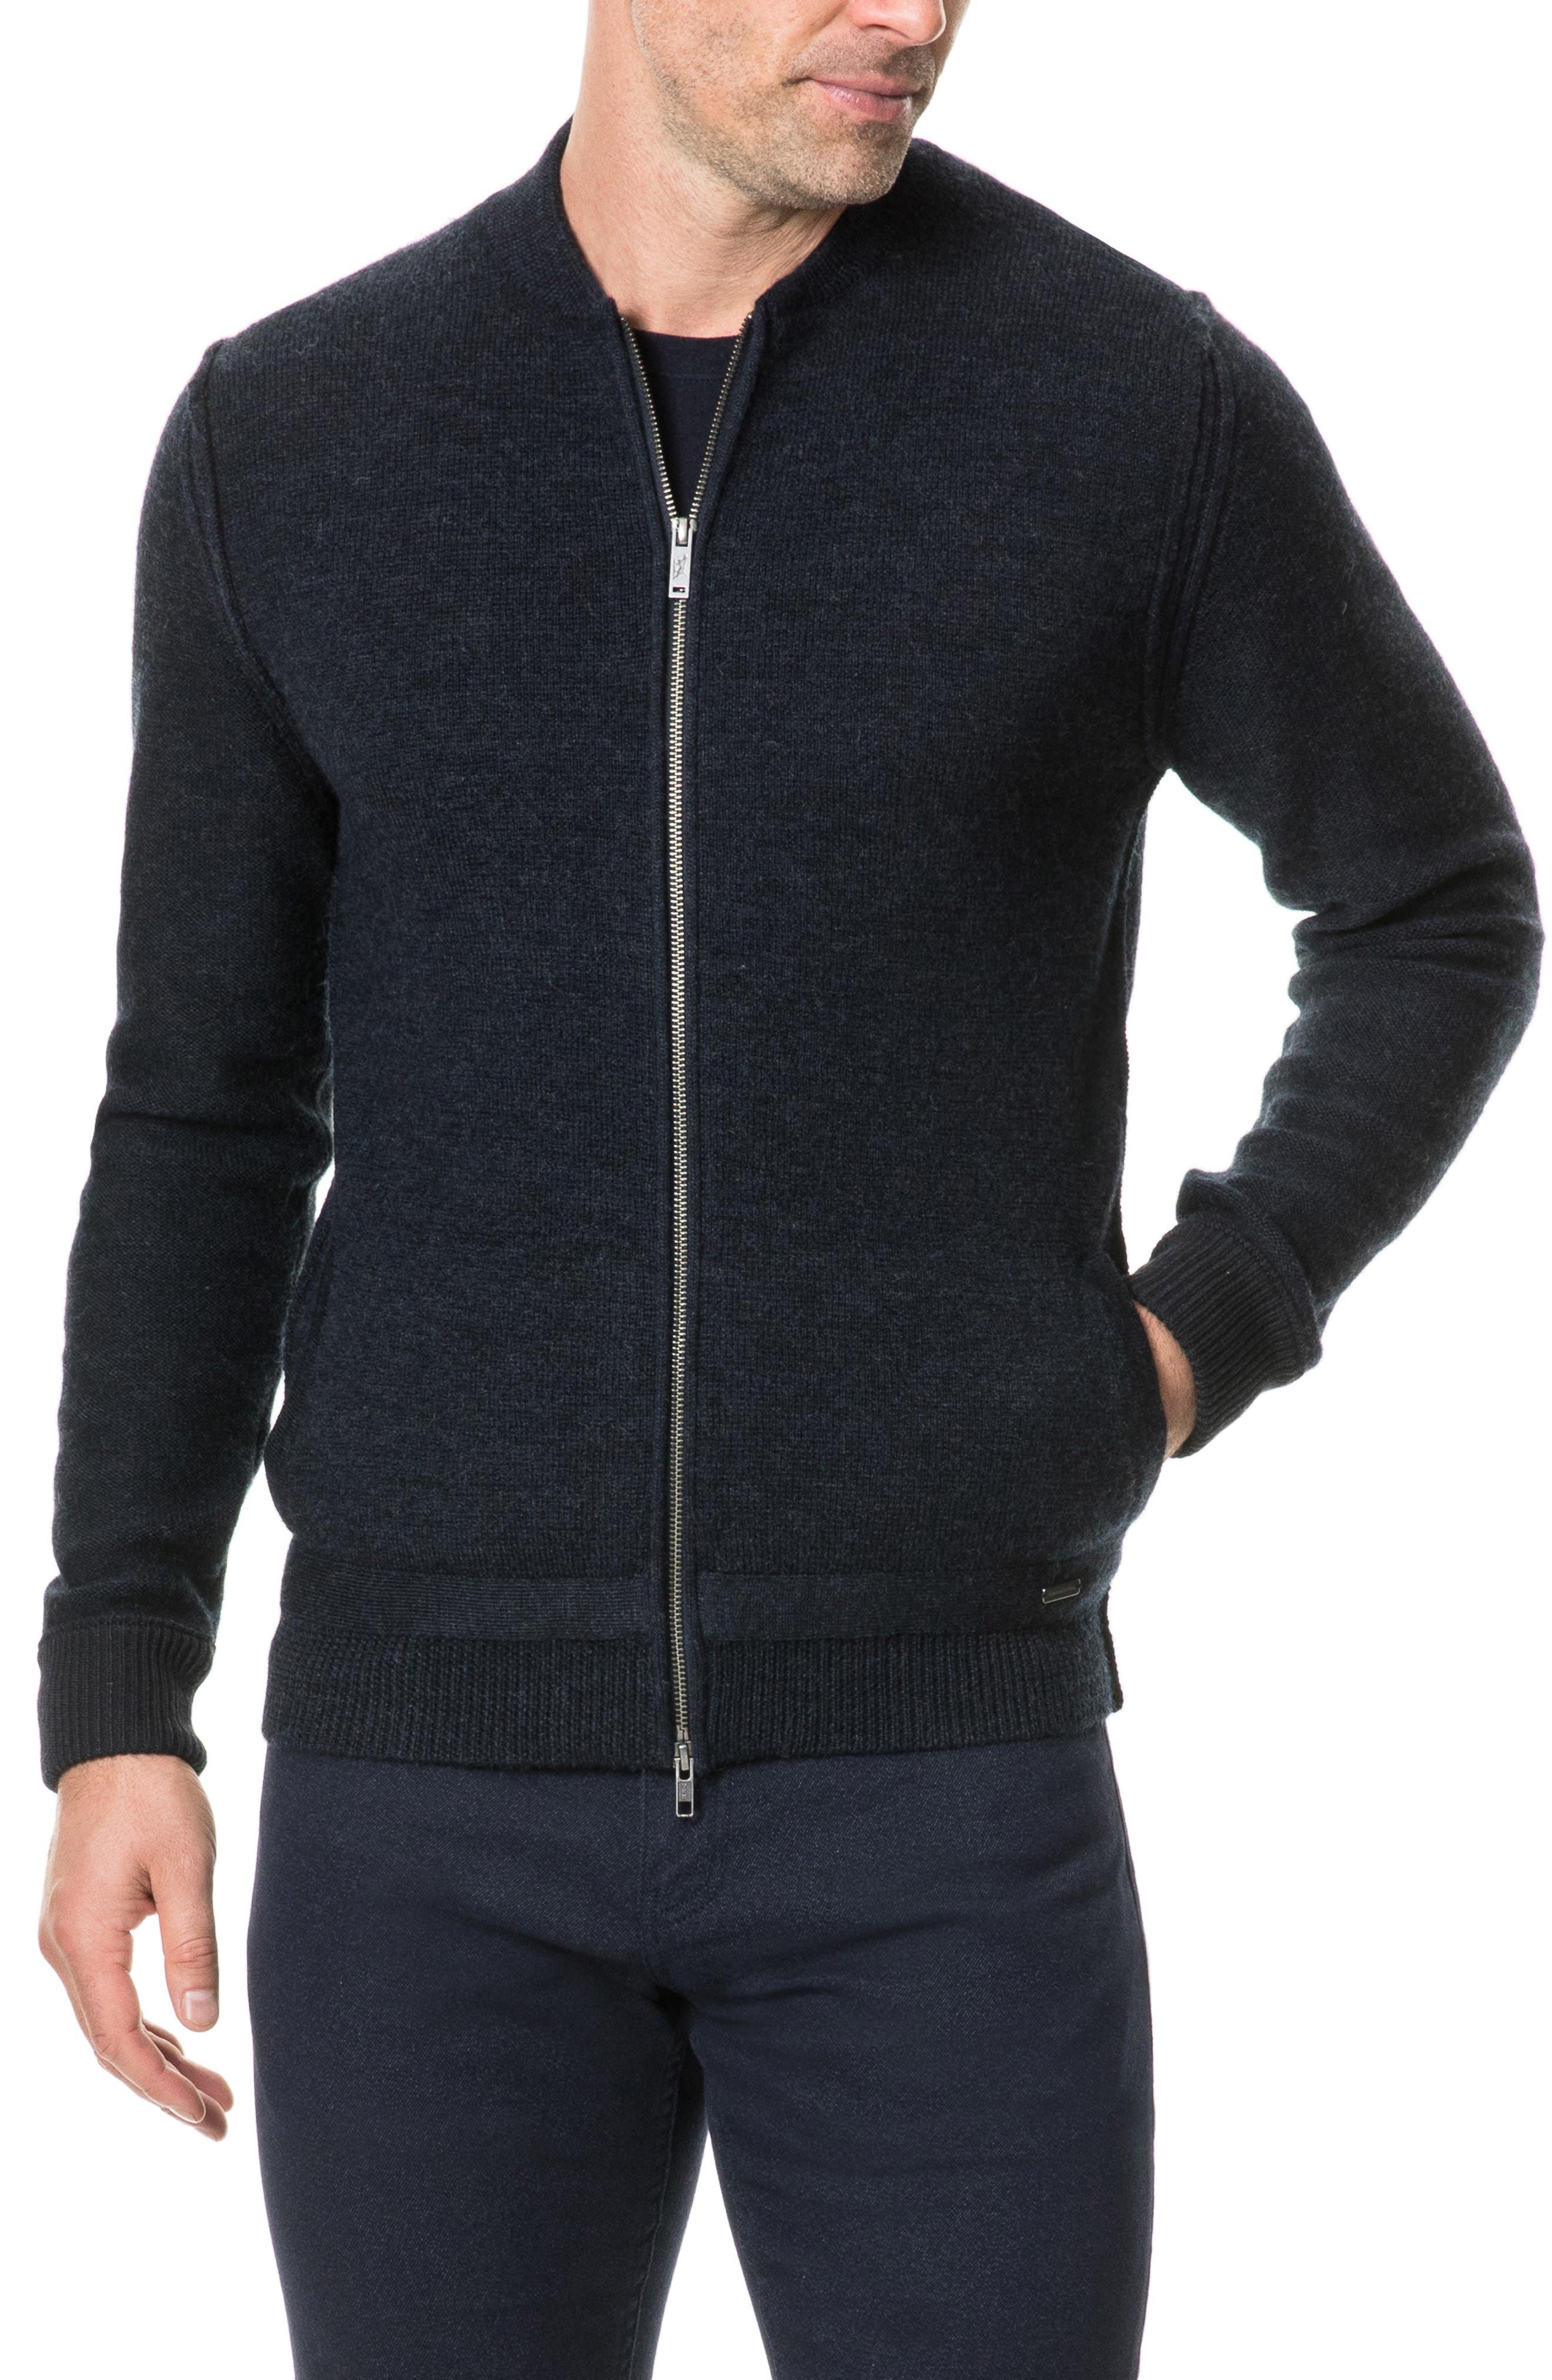 Fairton Regular Fit Wool Zip Front Sweater,                         Main,                         color, NAVY